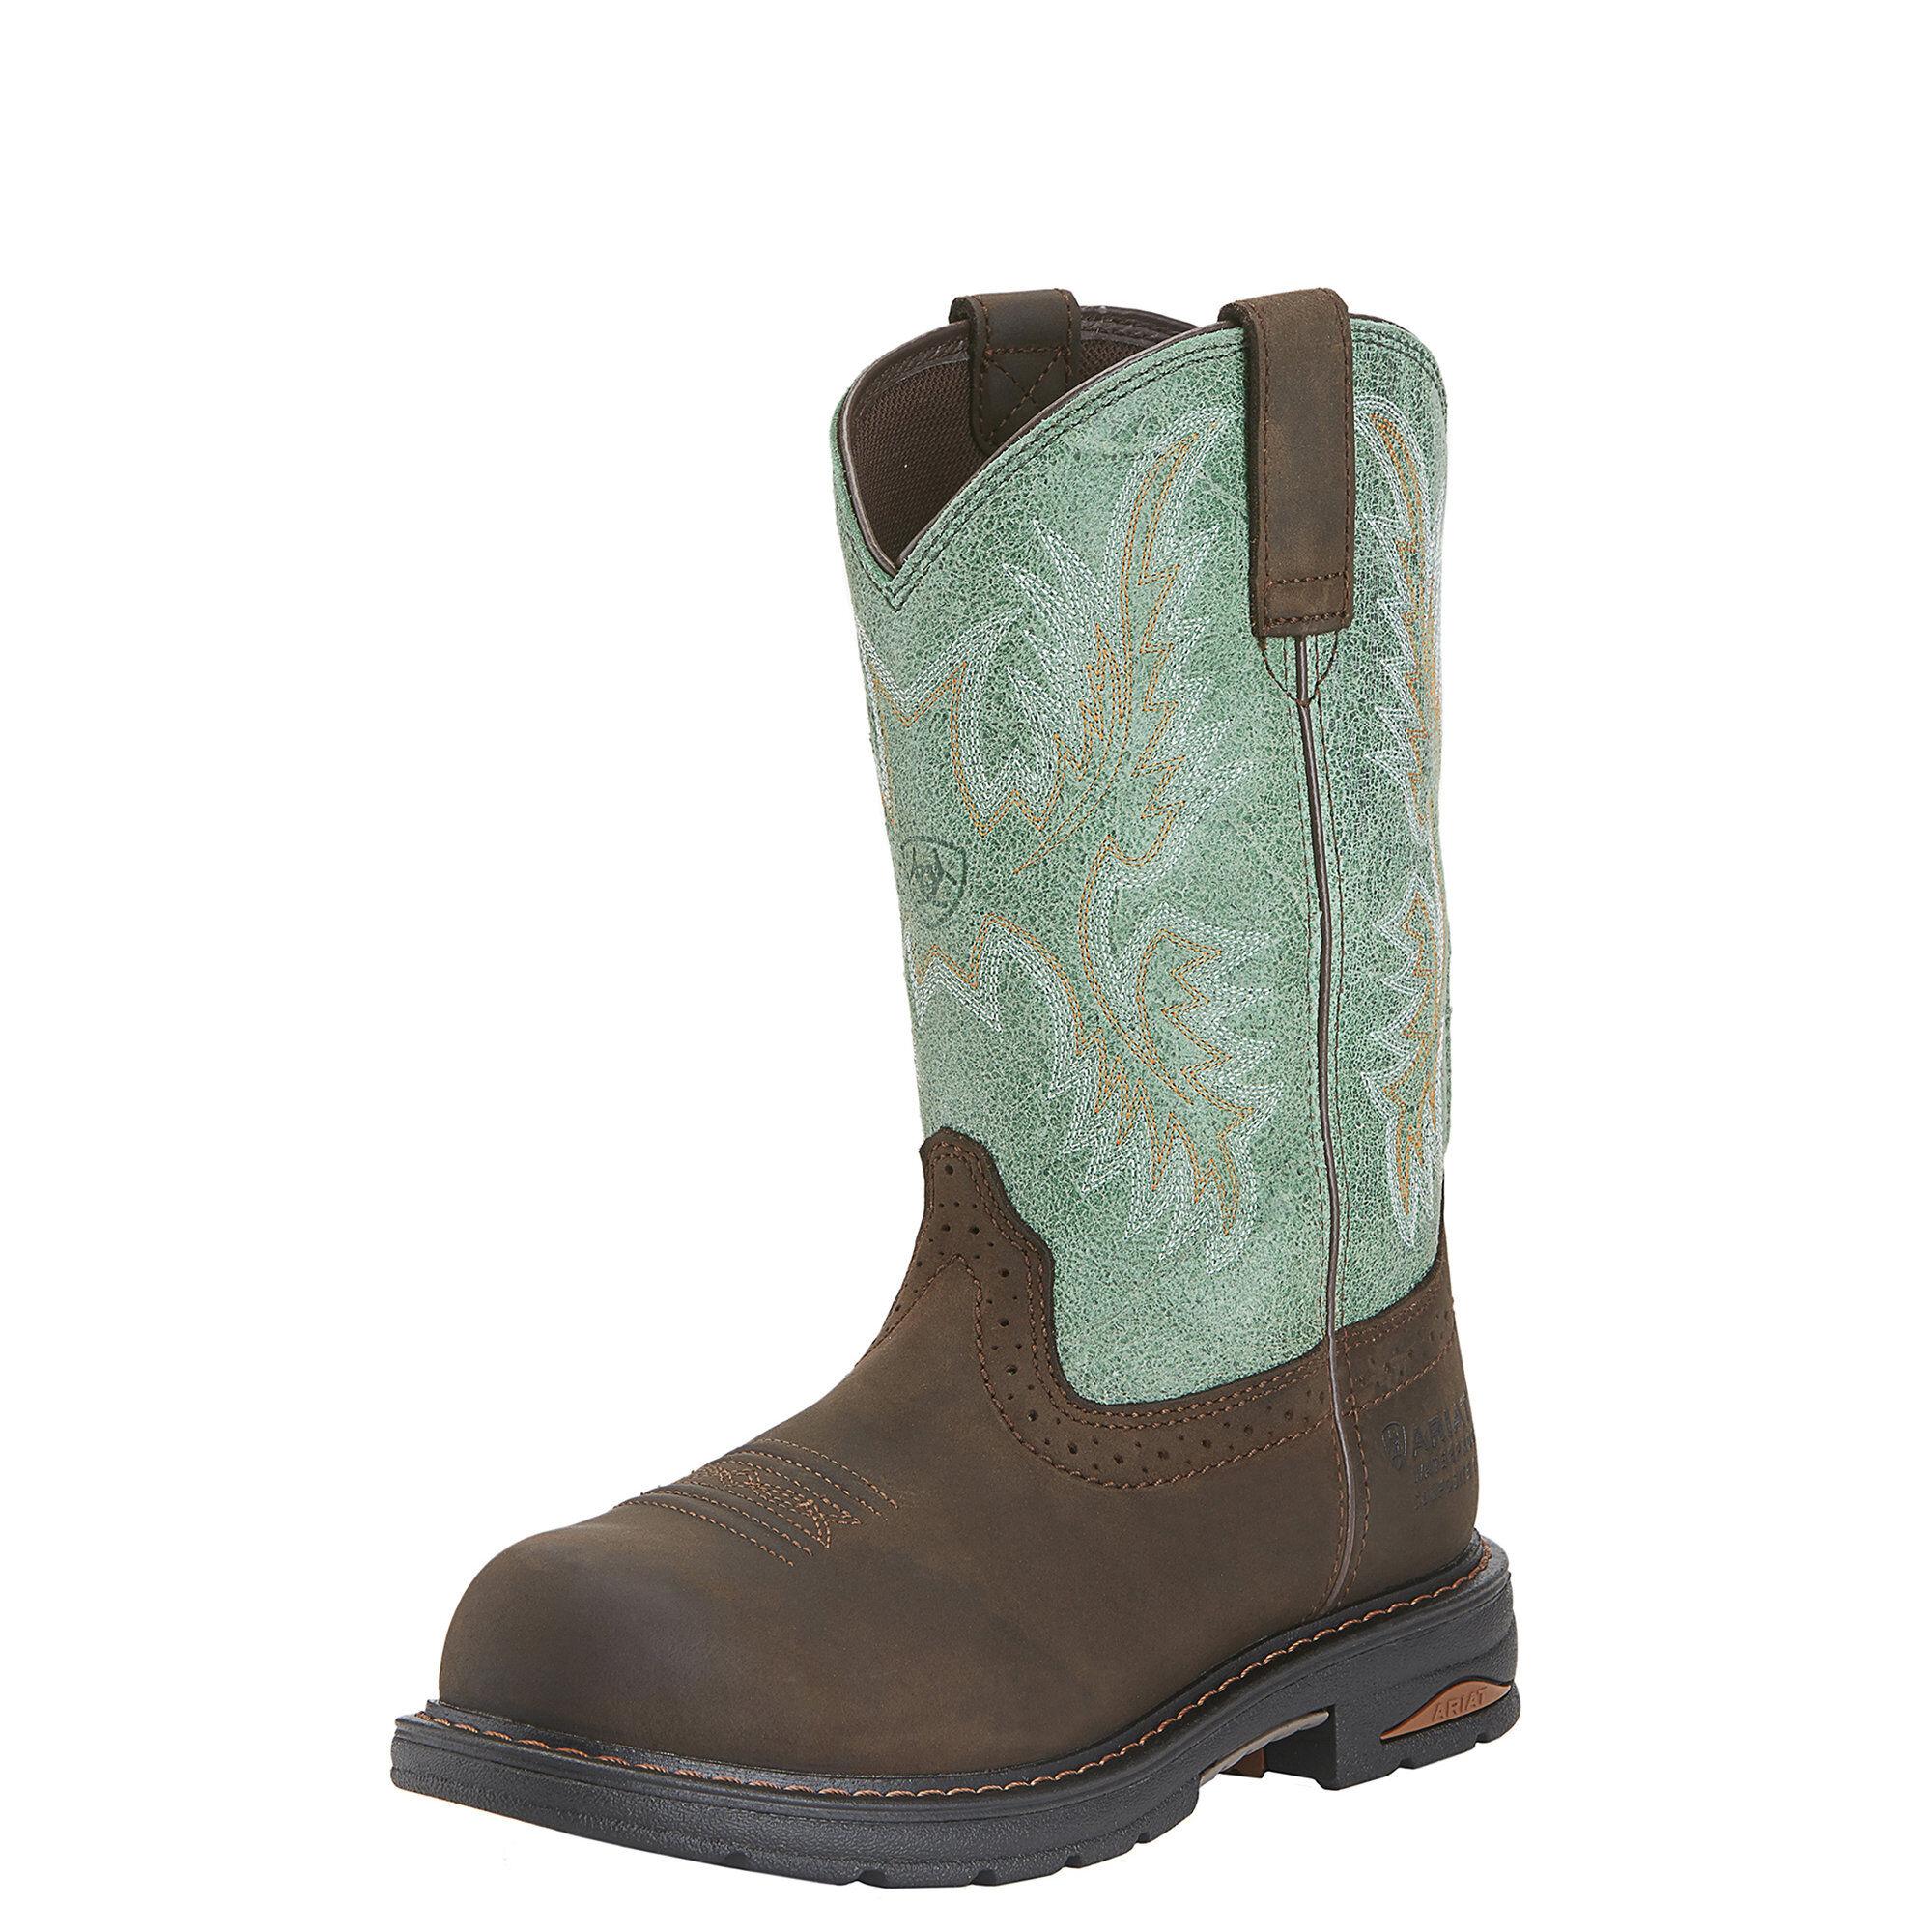 Women - Waterproof Leather Boots   Ariat